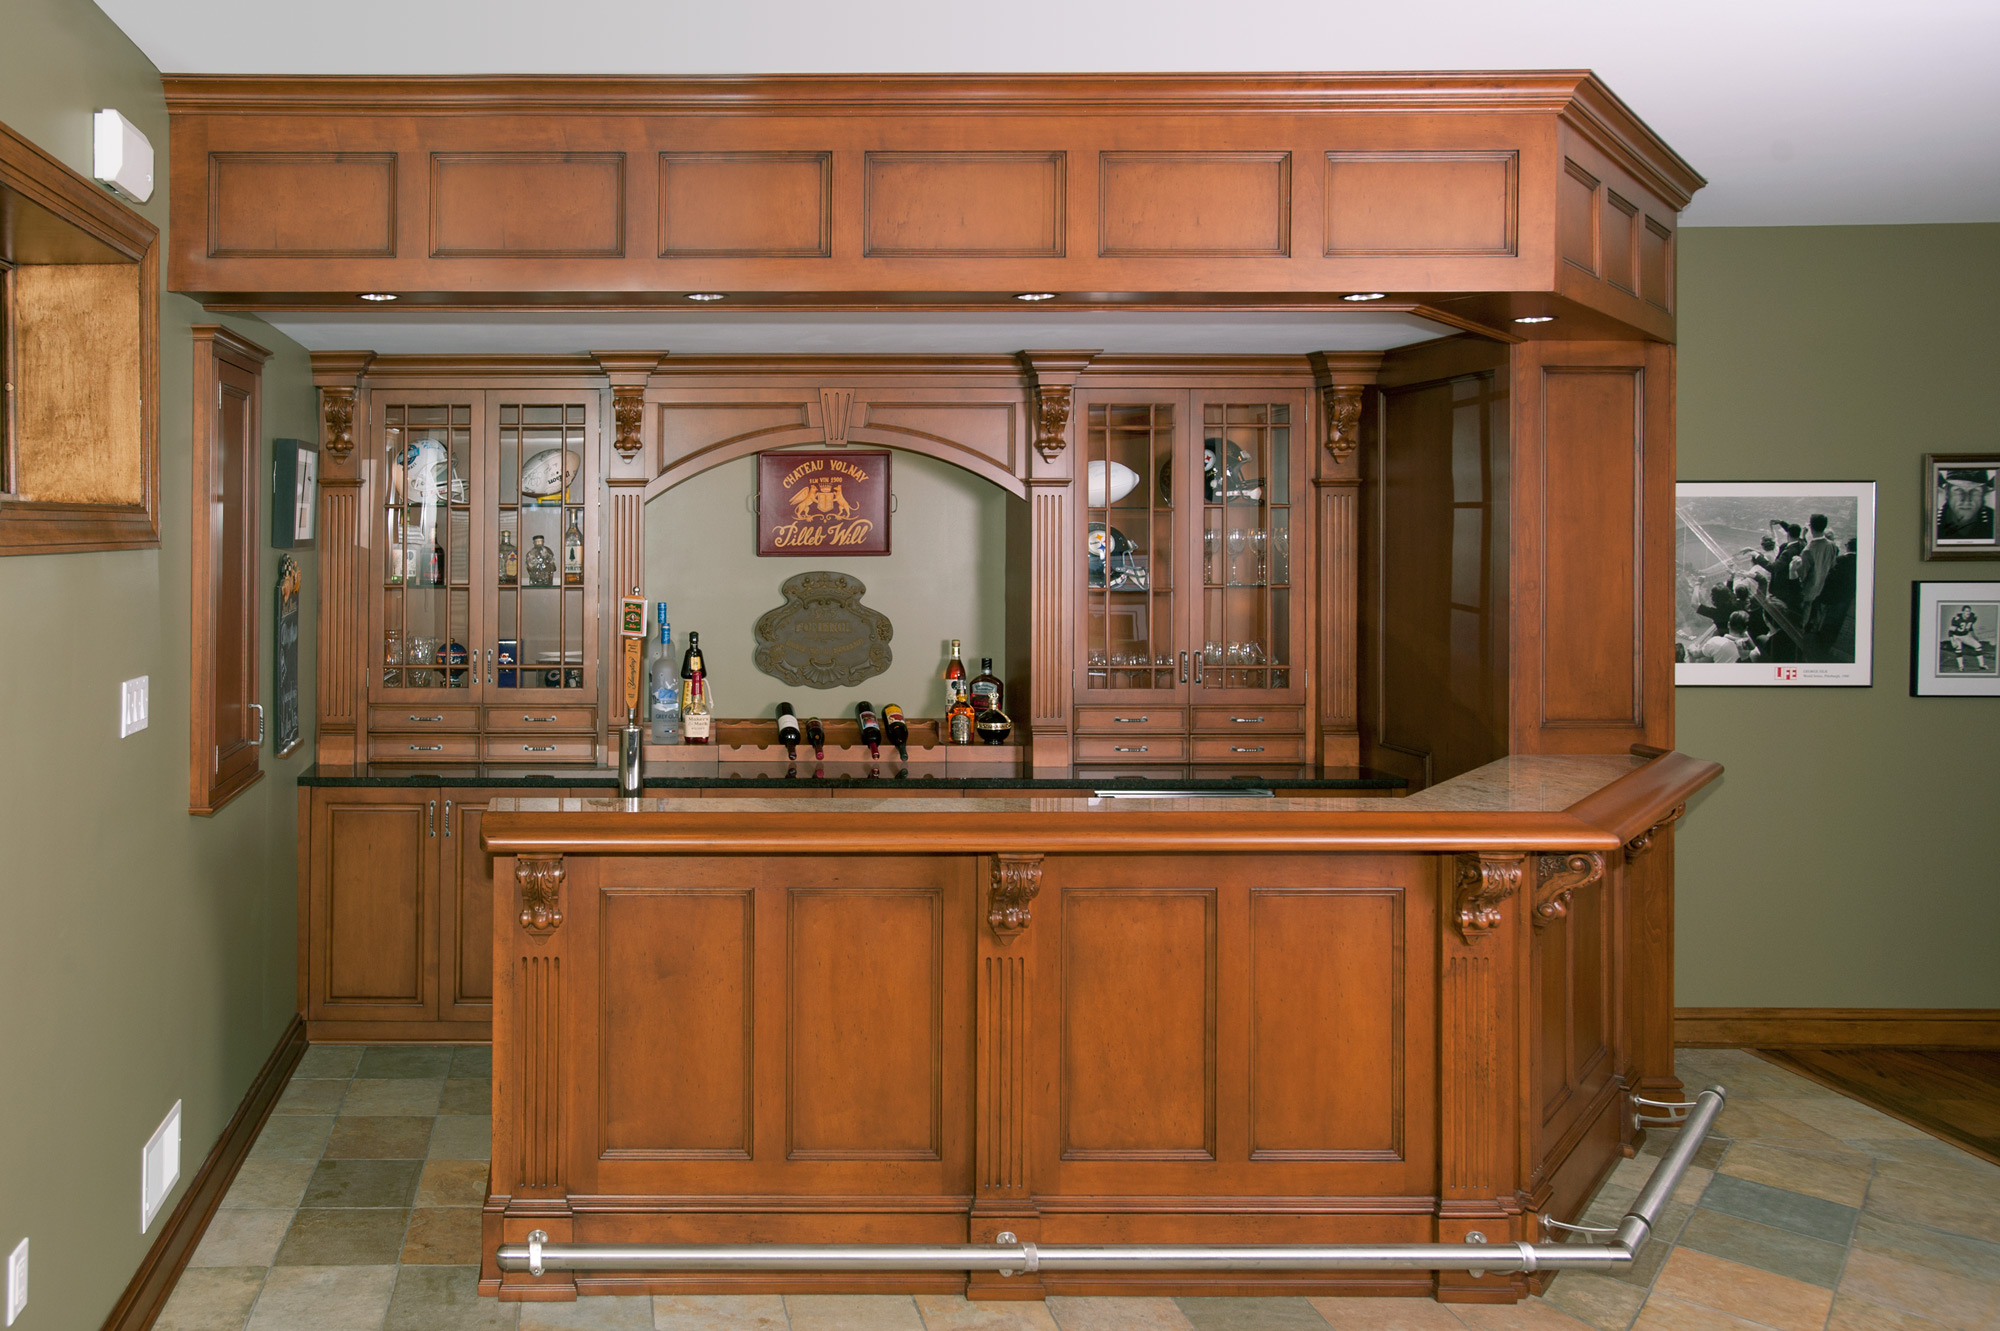 Irish Pub Home Bar  Custom Cabinetry by Ken Leech